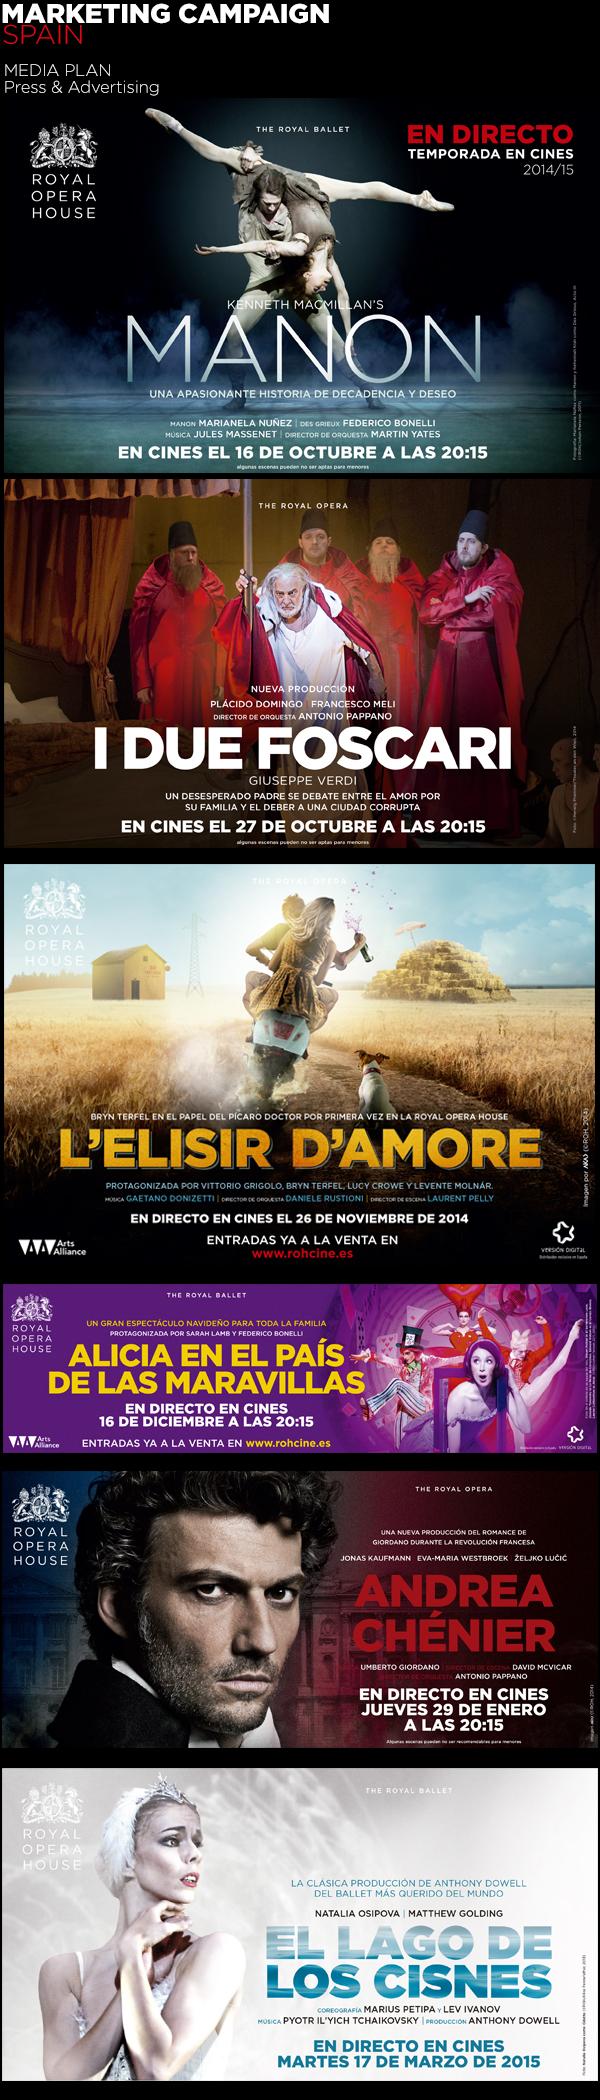 360º Event-Cinema Promotion - Royal Opera House